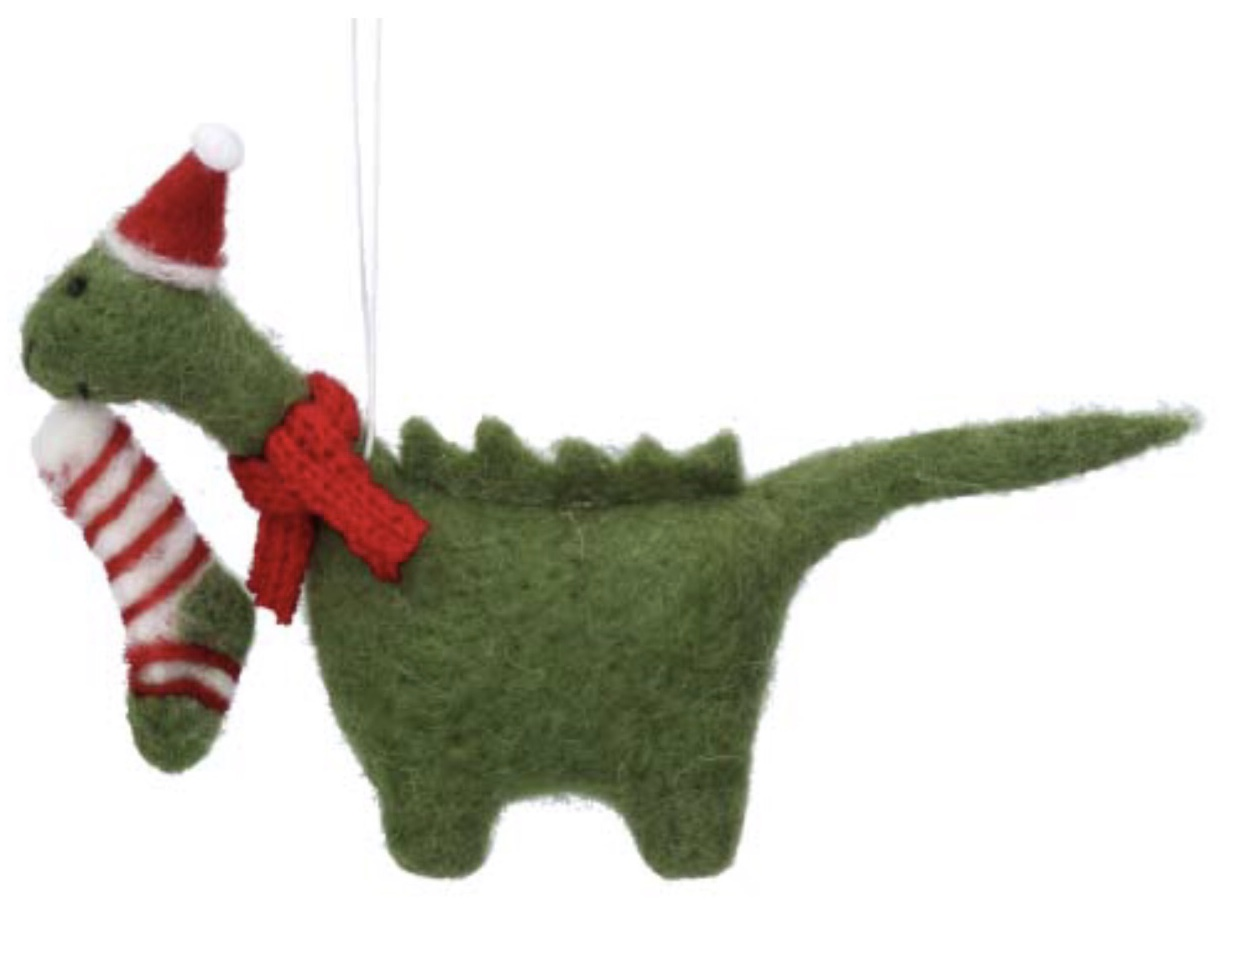 Nessie with stocking